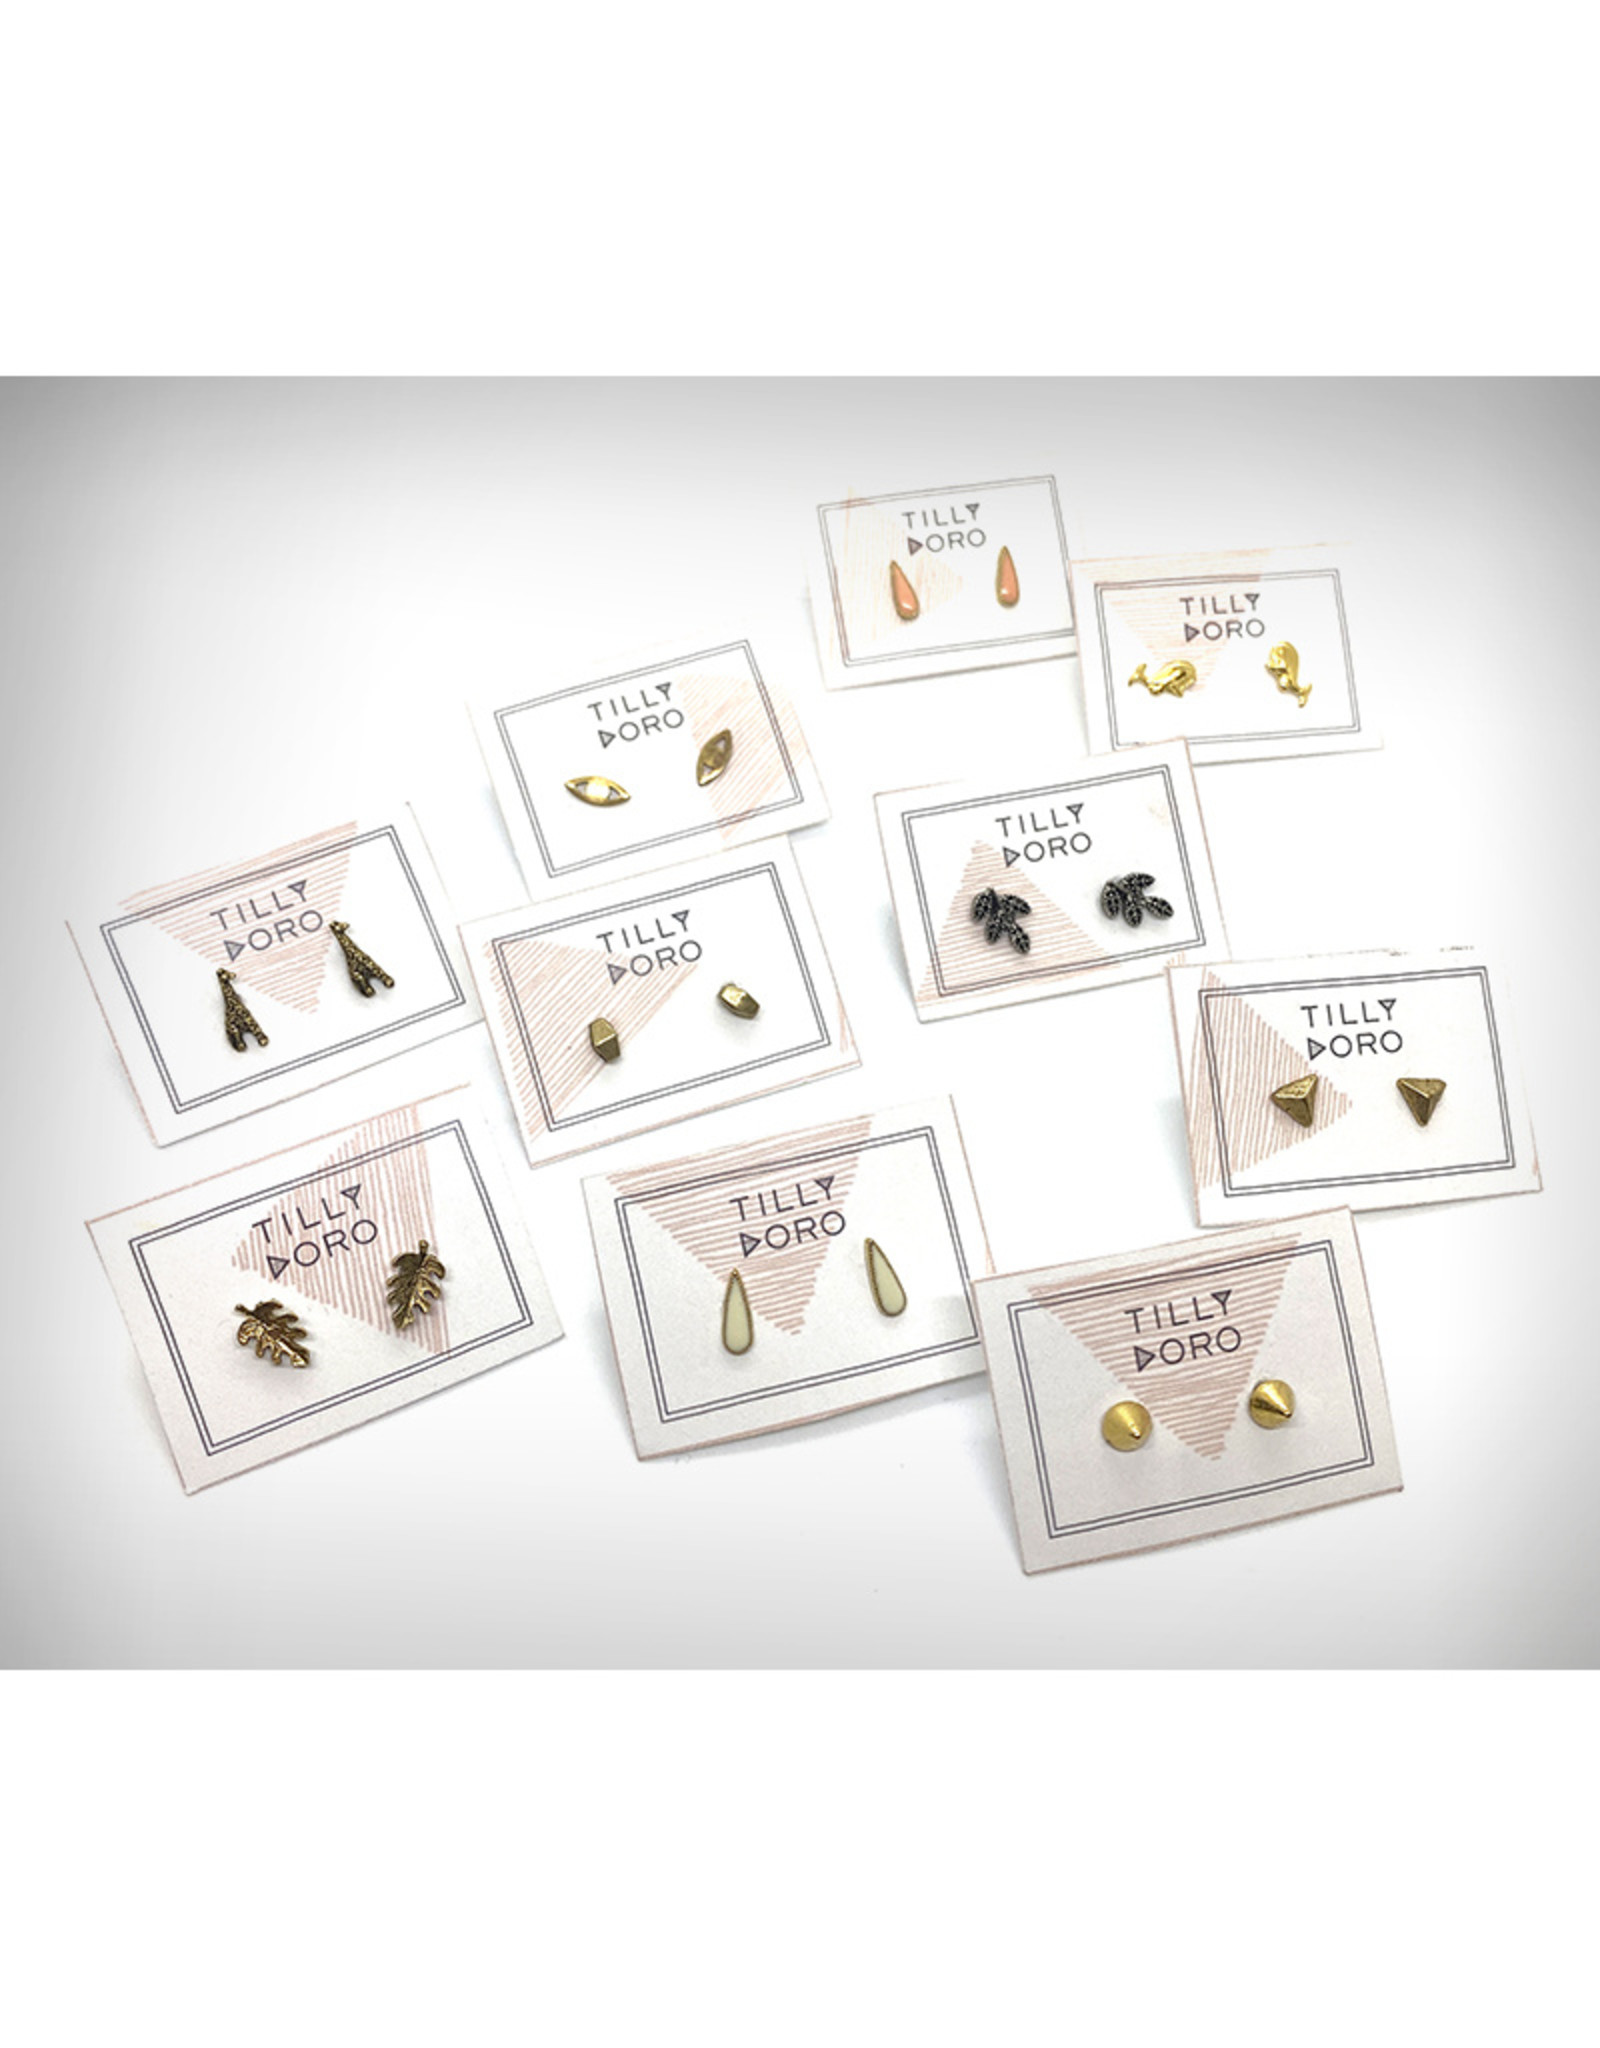 Tilly Doro Stud Earrings by Tillydoro